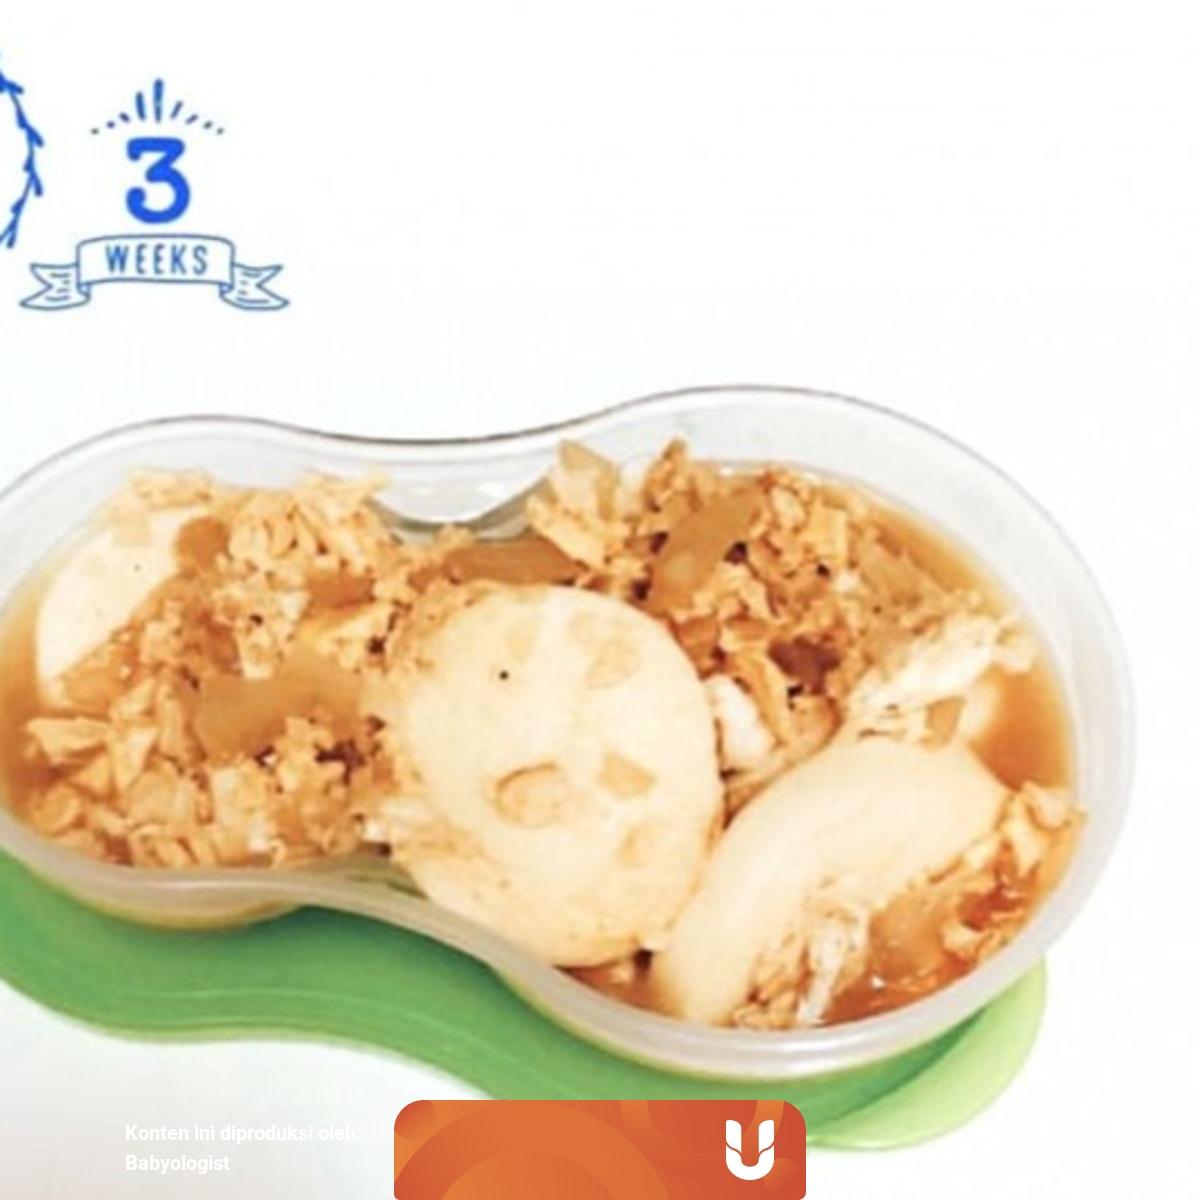 Resep Tofu Telur Saus Tiram Bye Bye Gtm Kumparan Com